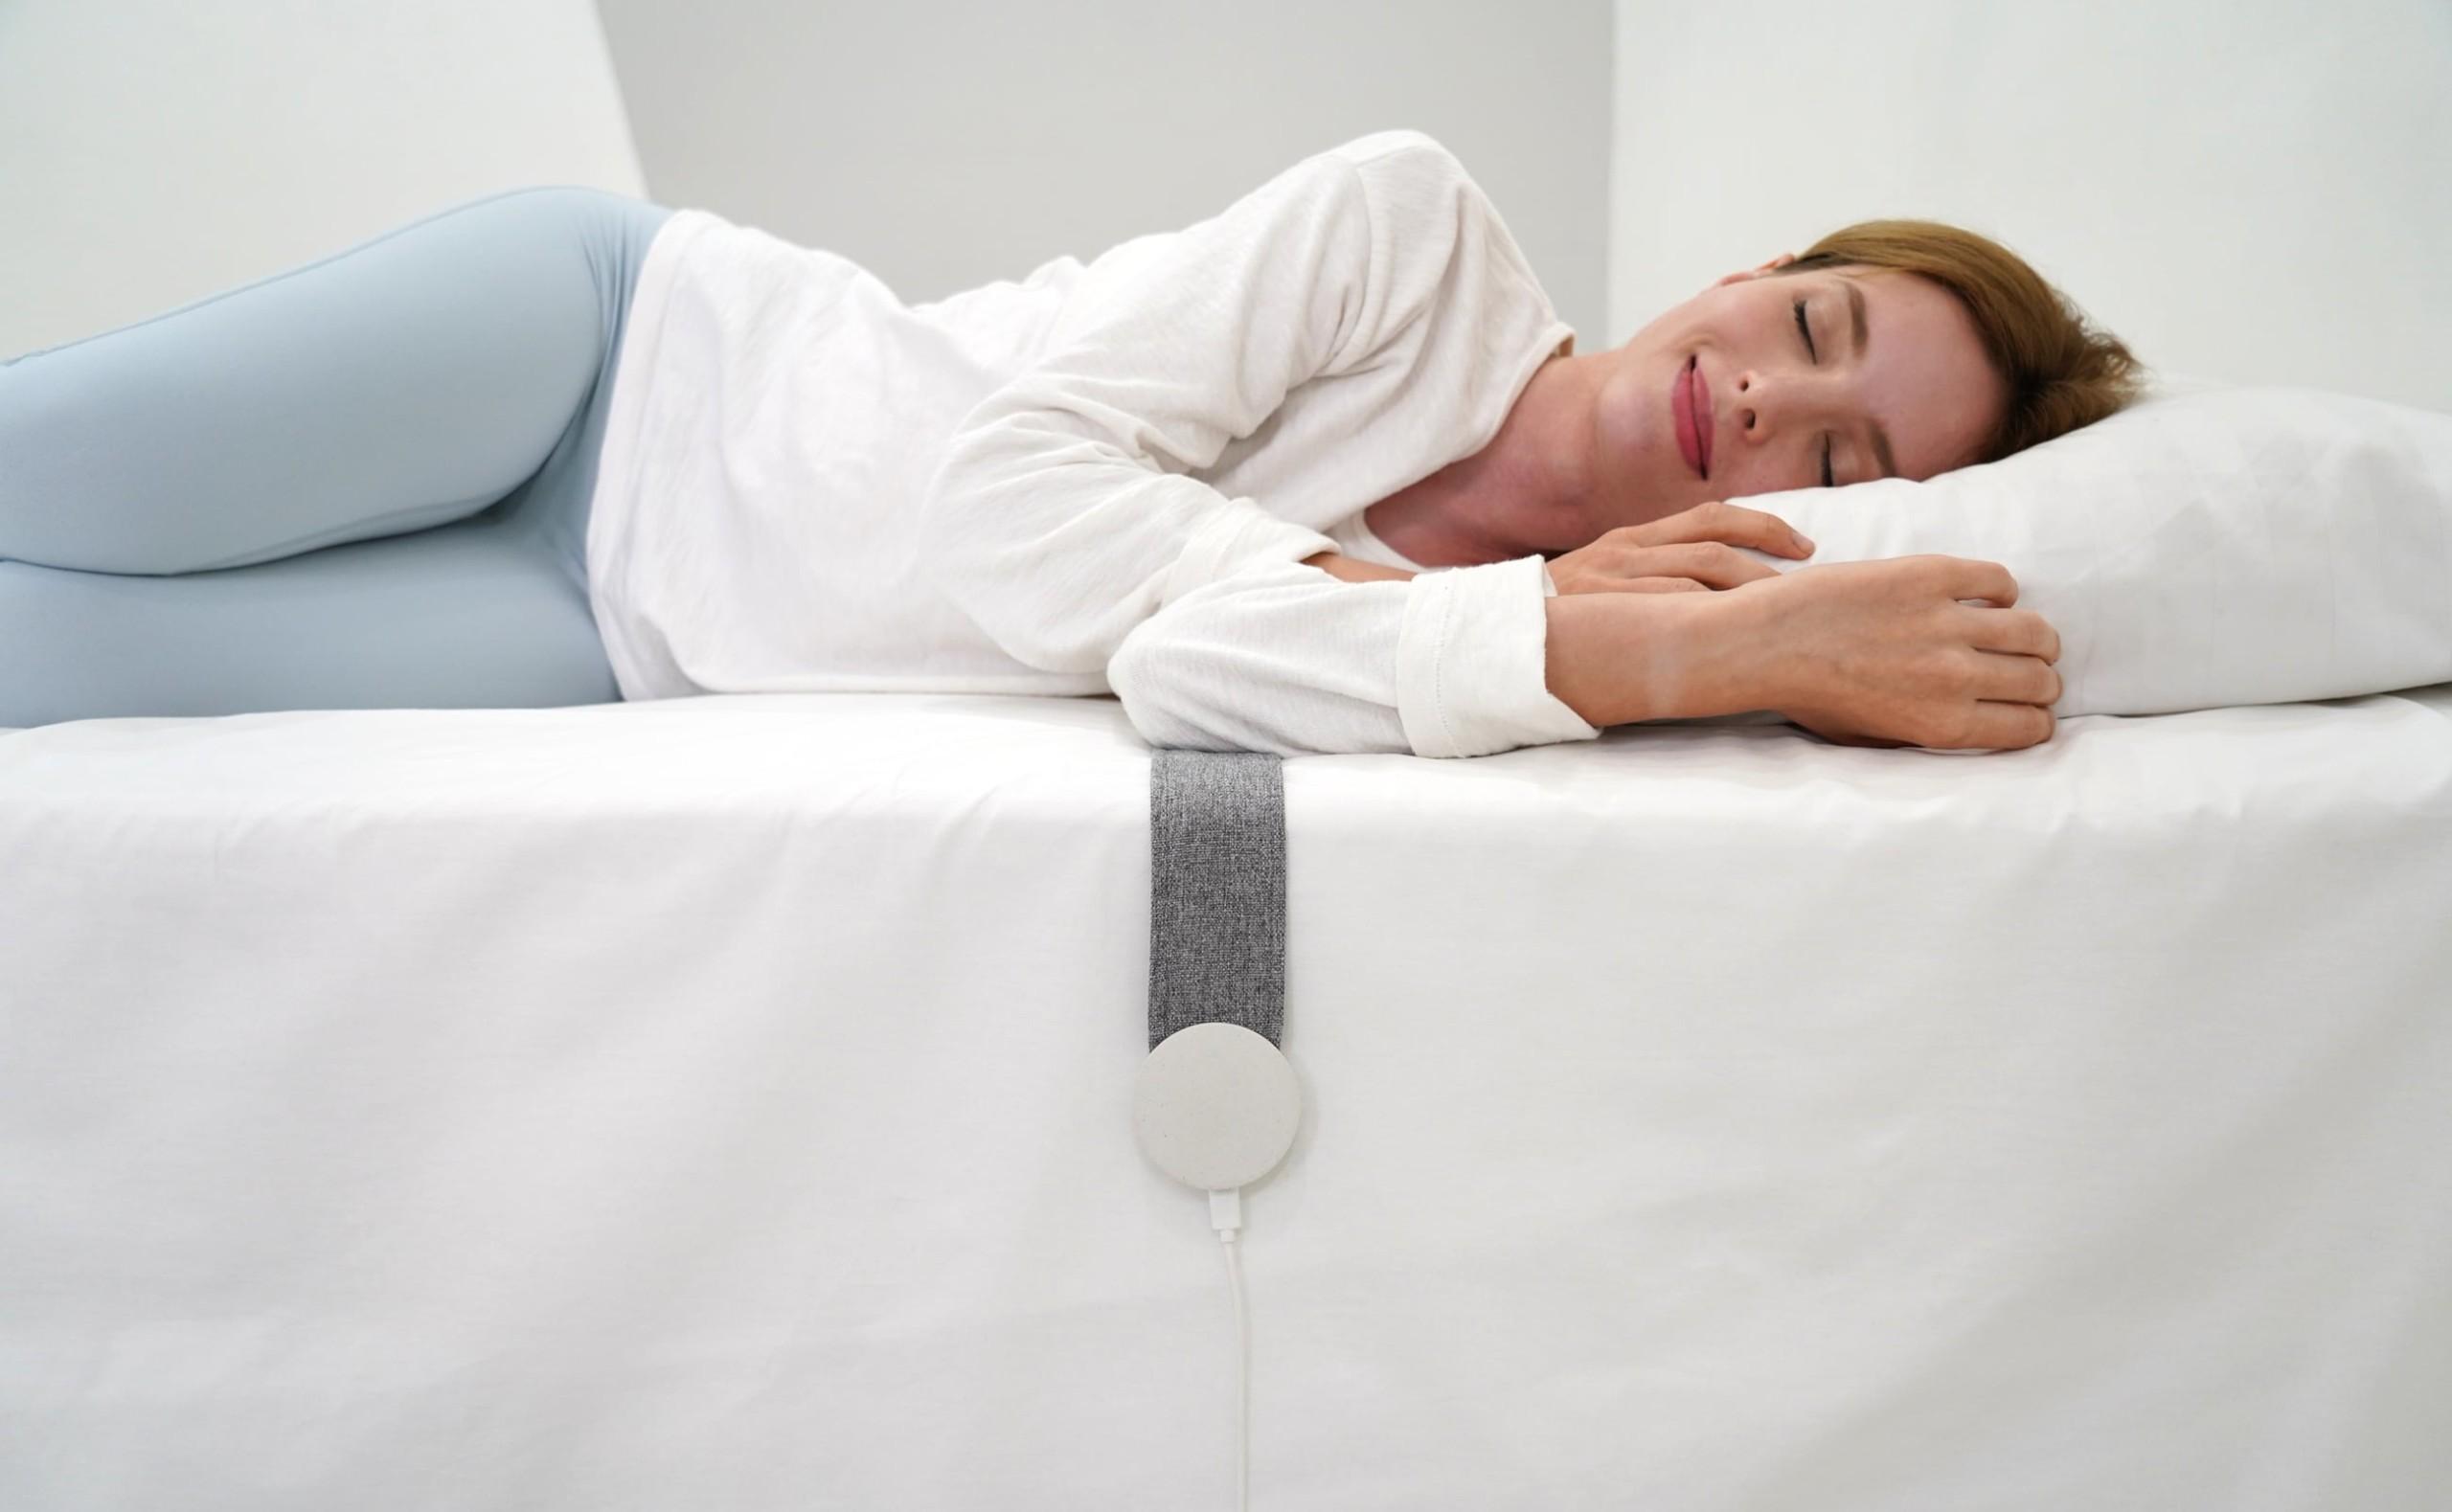 RESPIO Accurate Biometric Sleep Coach uses intelligent tracking to help you sleep better